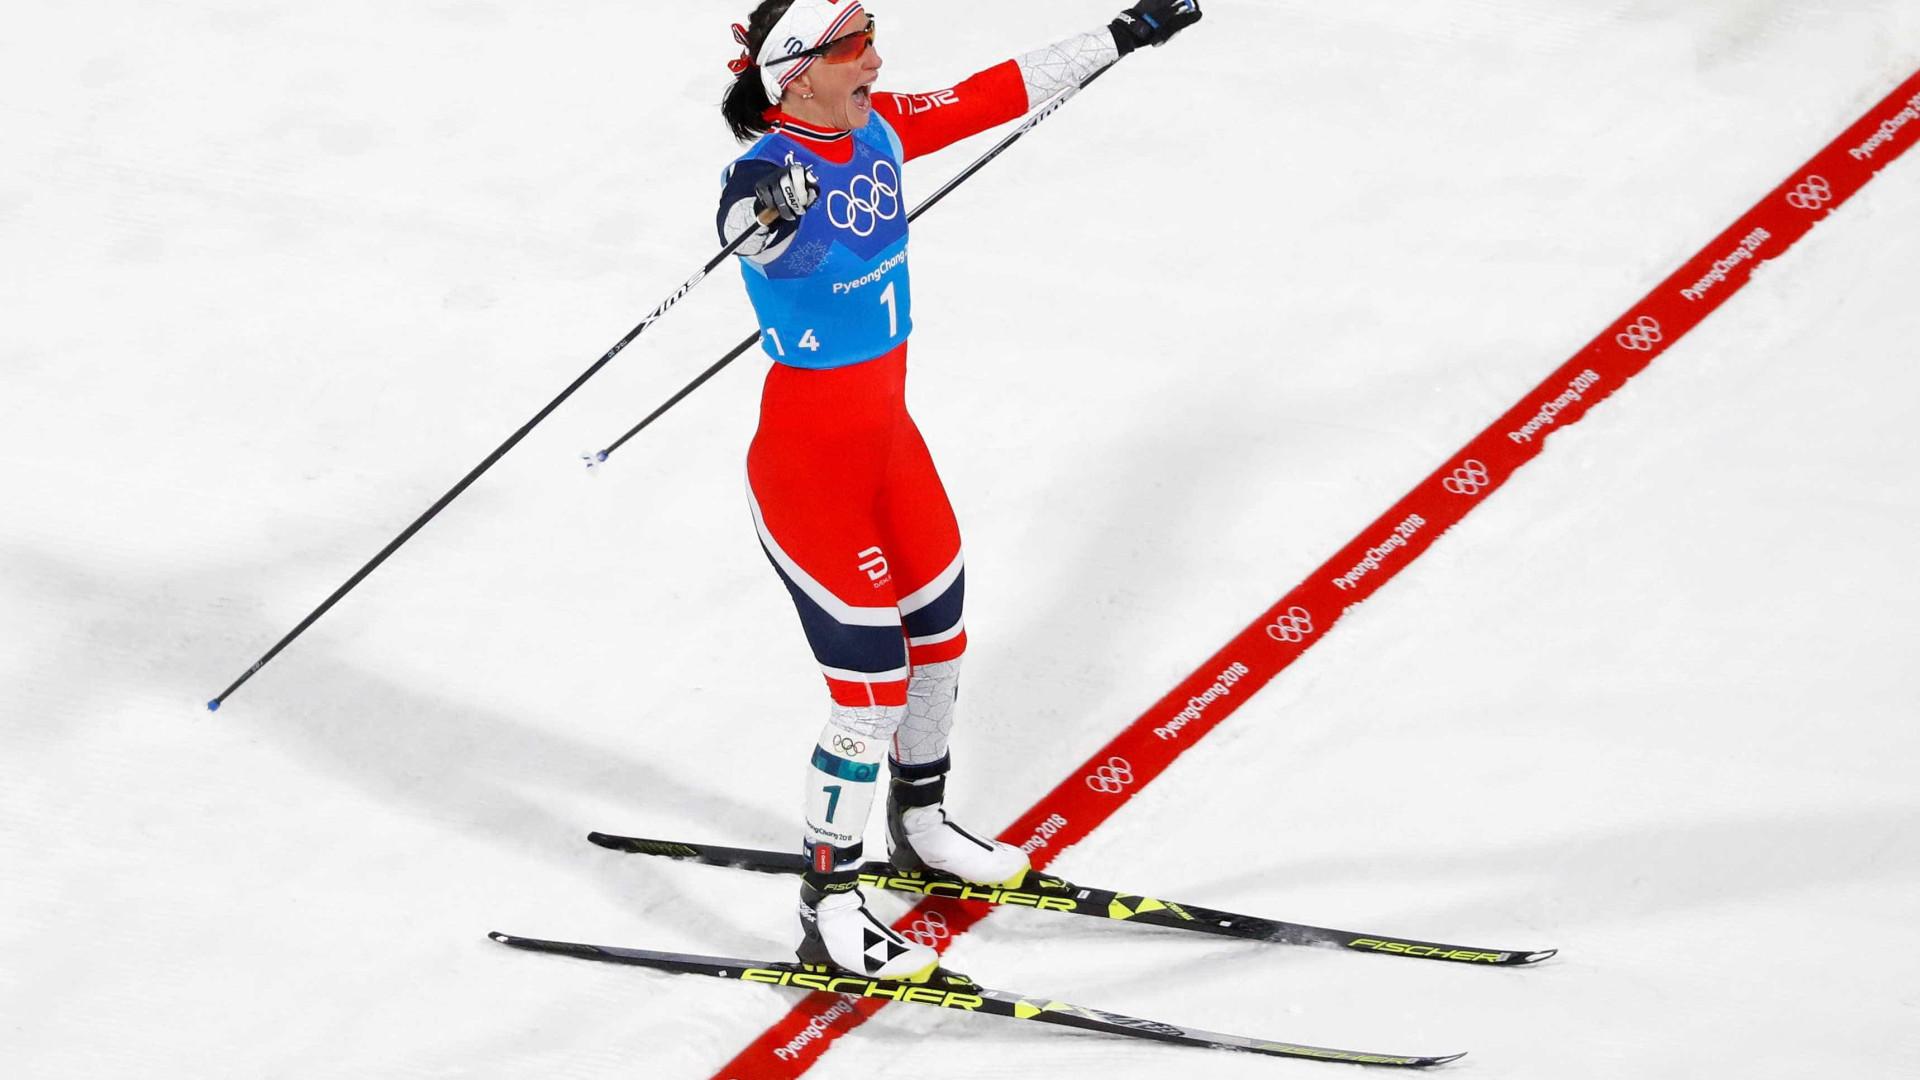 Norueguesa vence no esqui cross-country e iguala recorde olímpico